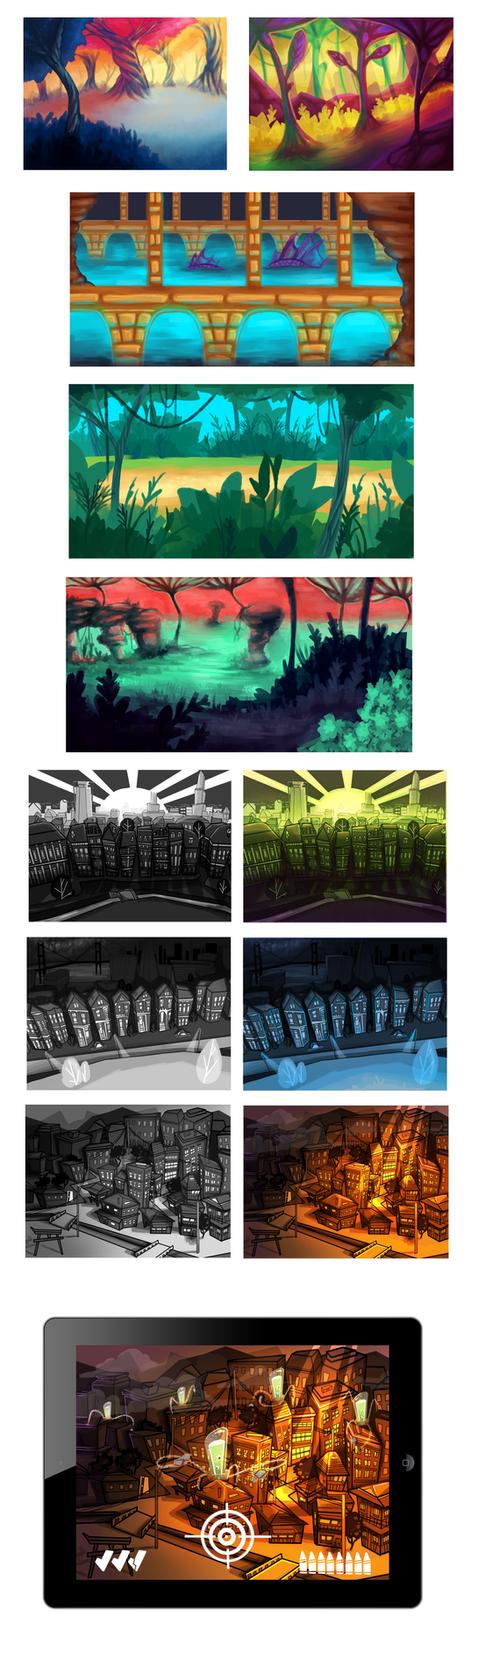 Backgrounds dump by Olievlek